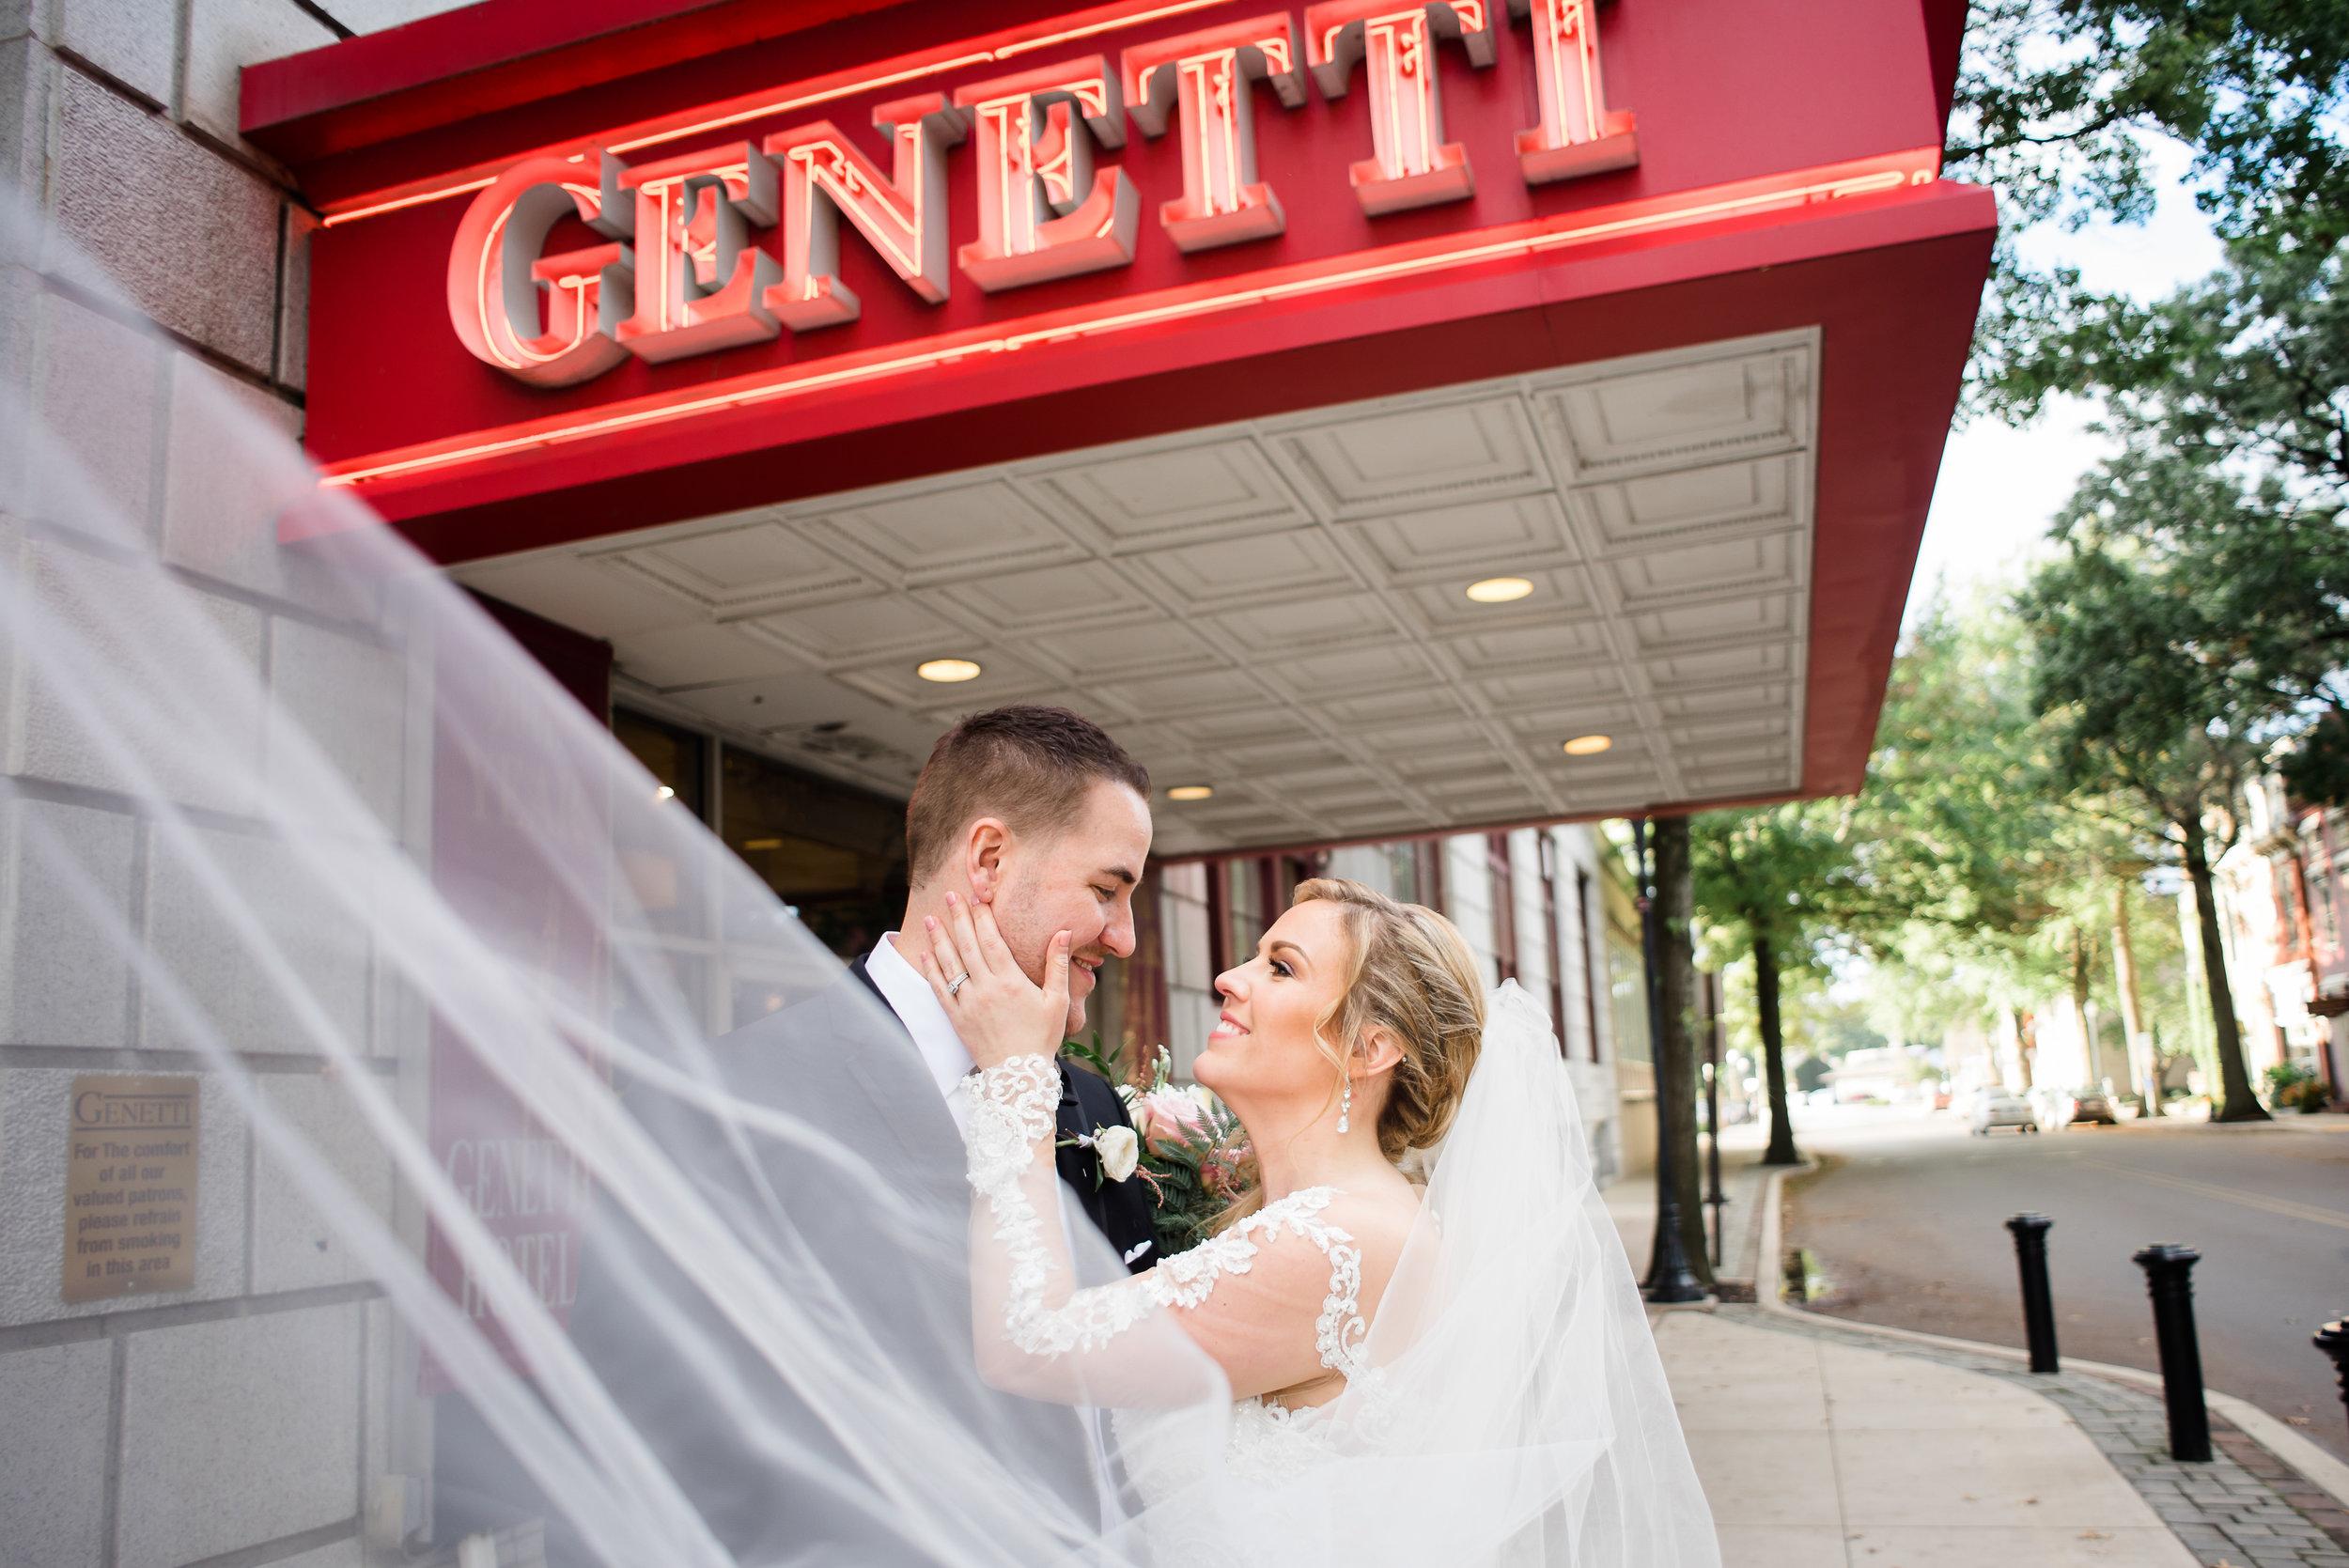 genetti-wedding (5).jpg